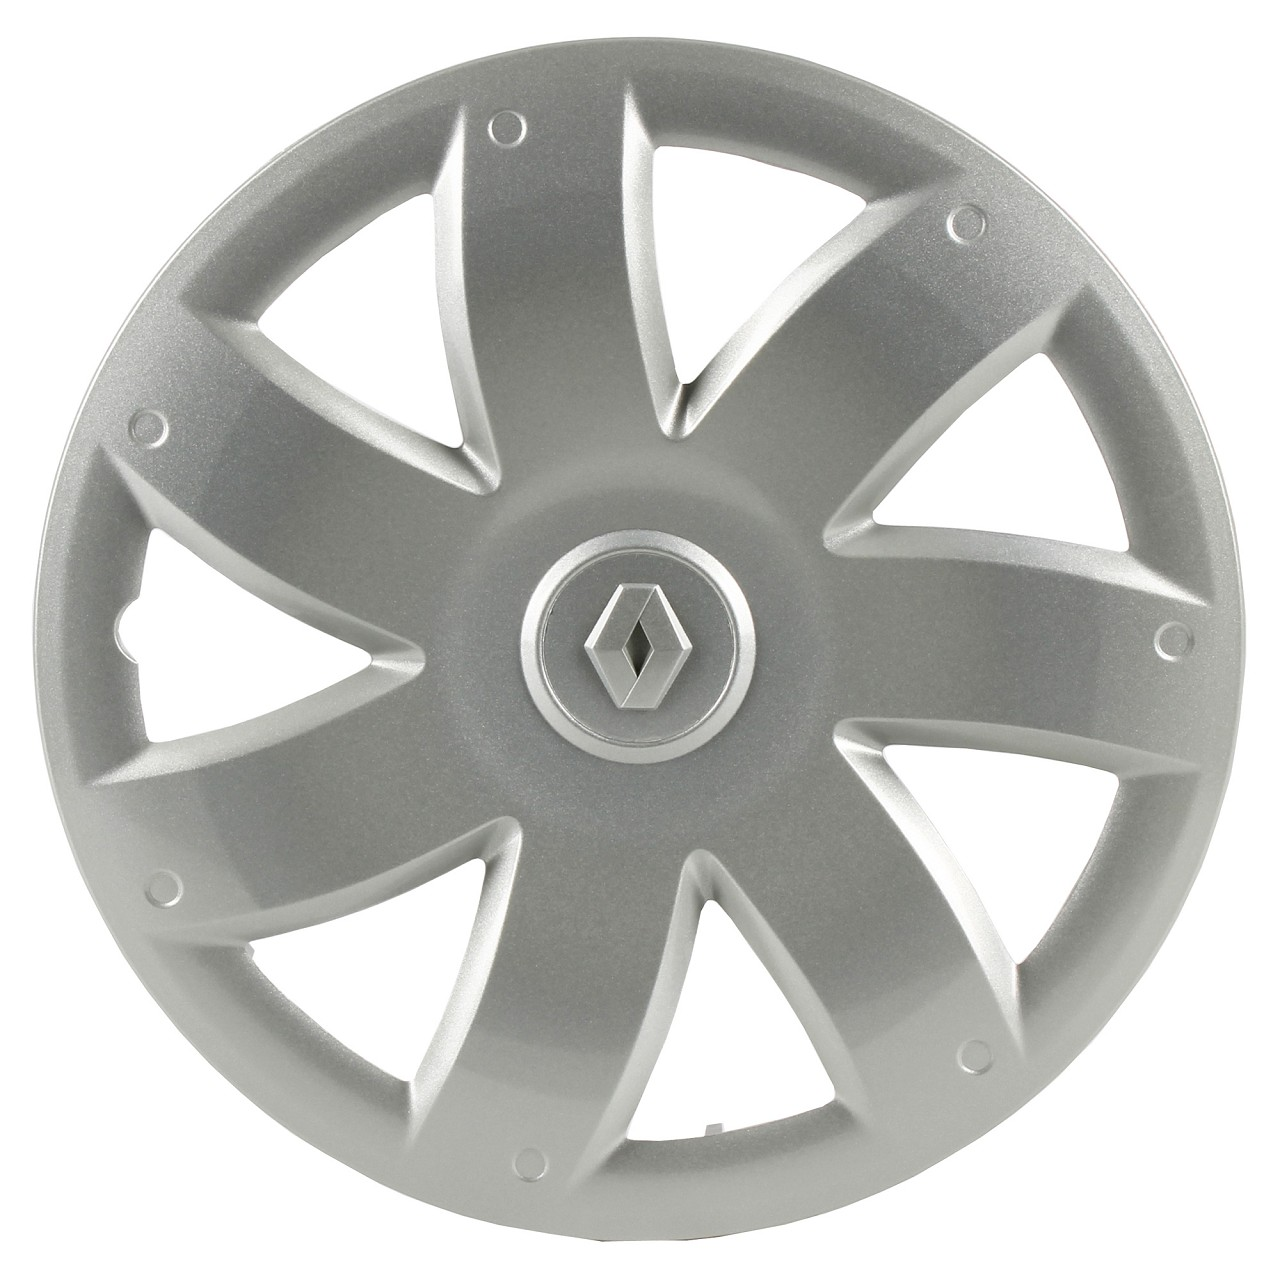 ORIGINAL Renault Radkappe Radblende SILBER 15 Zoll (1 Stück) 7711426514